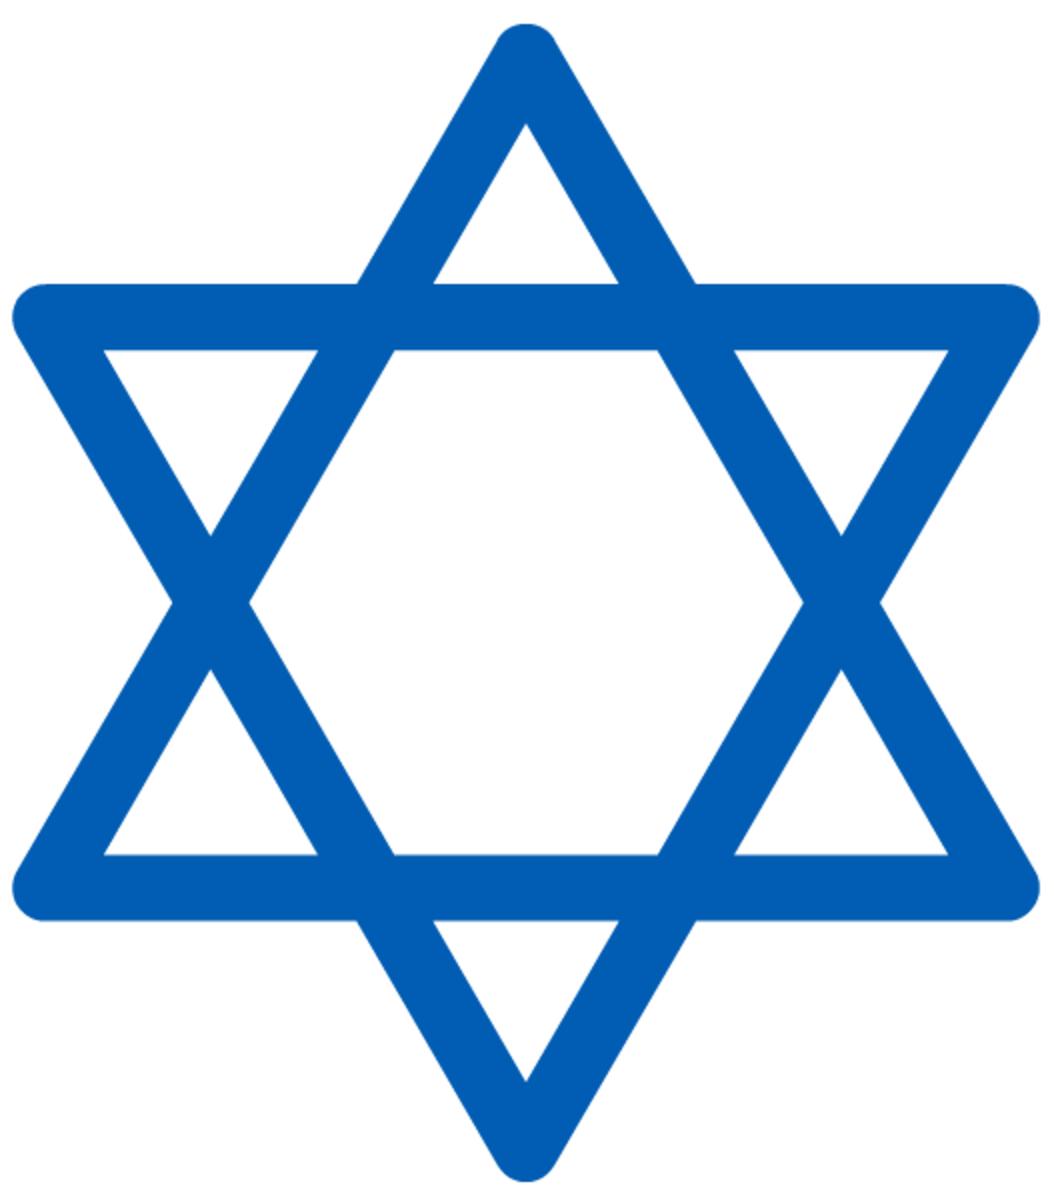 Hanukkah symbols: star of David